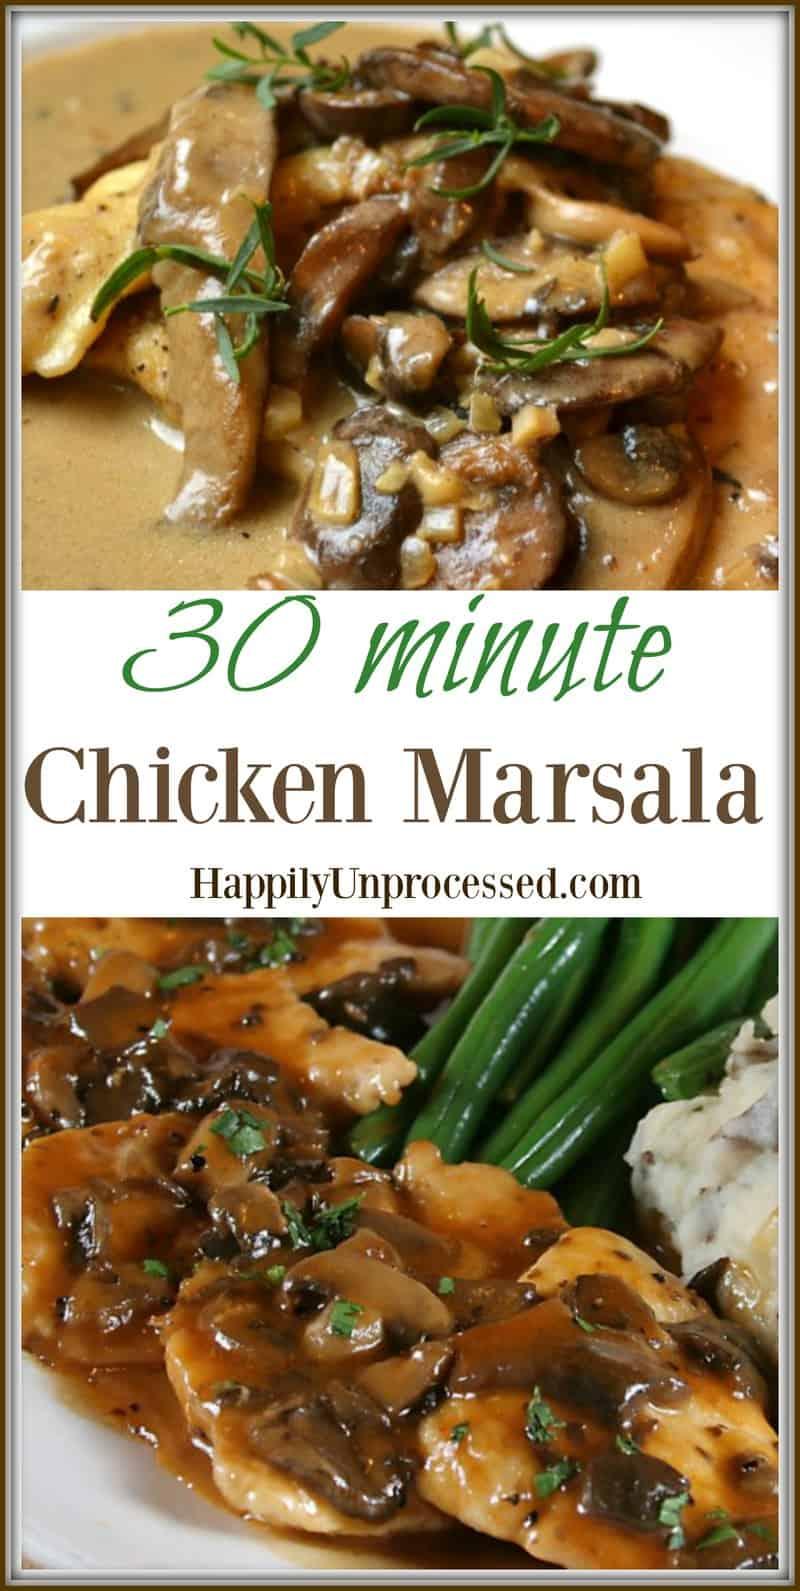 Chicken Marsala Mashed Potatoes